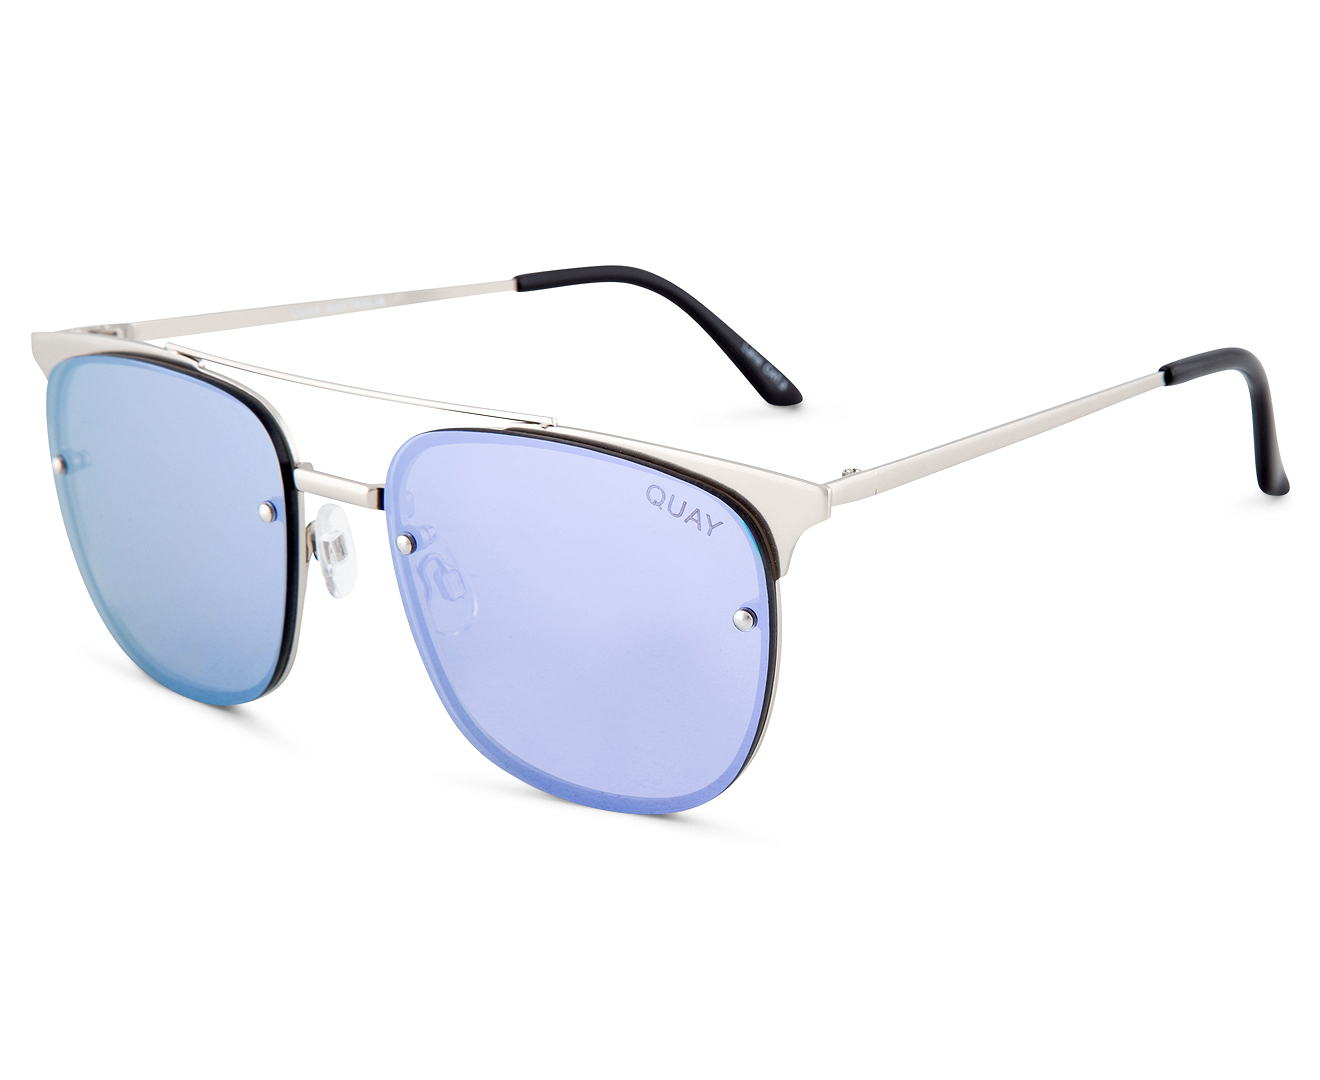 QUAY AUSTRALIA Private Eyes Women Sunglasses Silver w// Purple Lens Size CAT.3